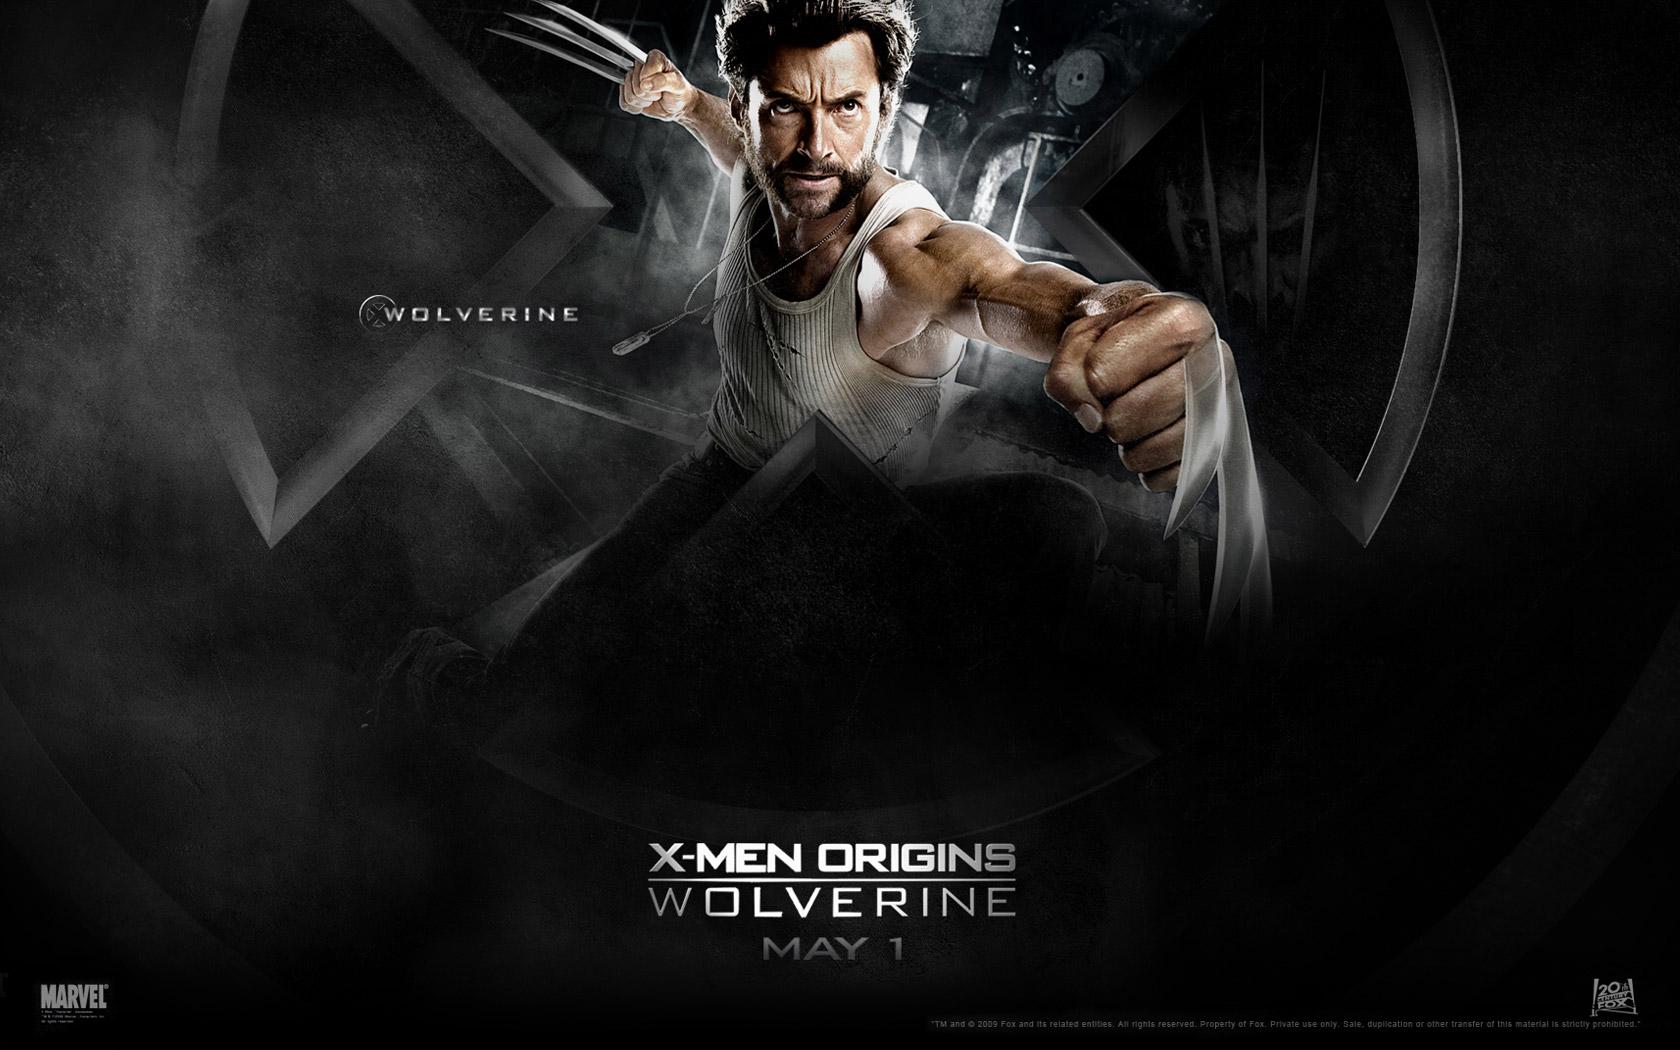 Hd wallpaper x man - 21 X Men Origins Wolverine Hd Wallpapers Backgrounds Wallpaper Abyss